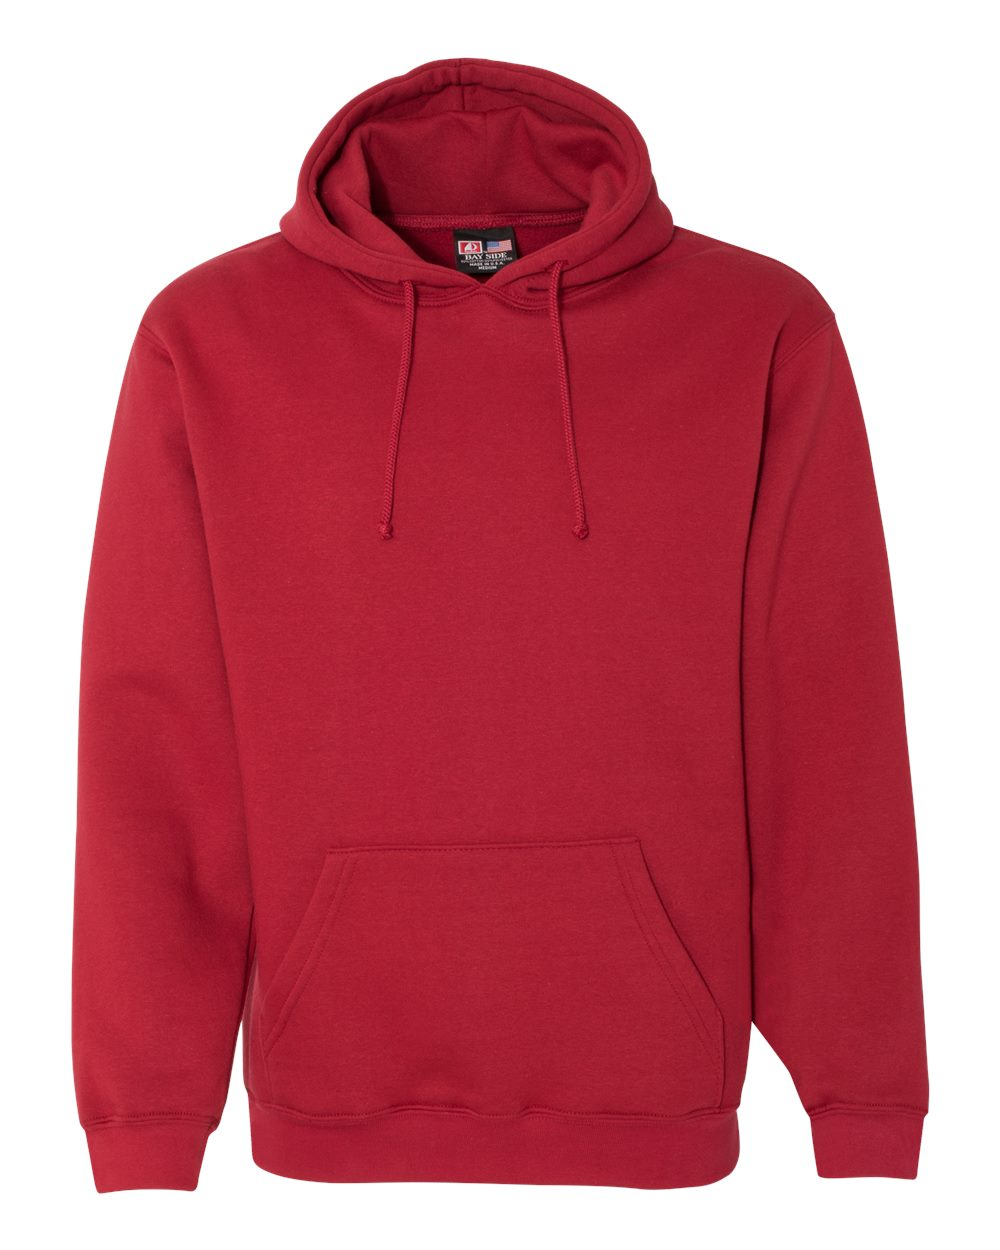 Bayside-Mens-Blank-USA-Made-Hooded-Sweatshirt-960-up-to-6XL miniature 9